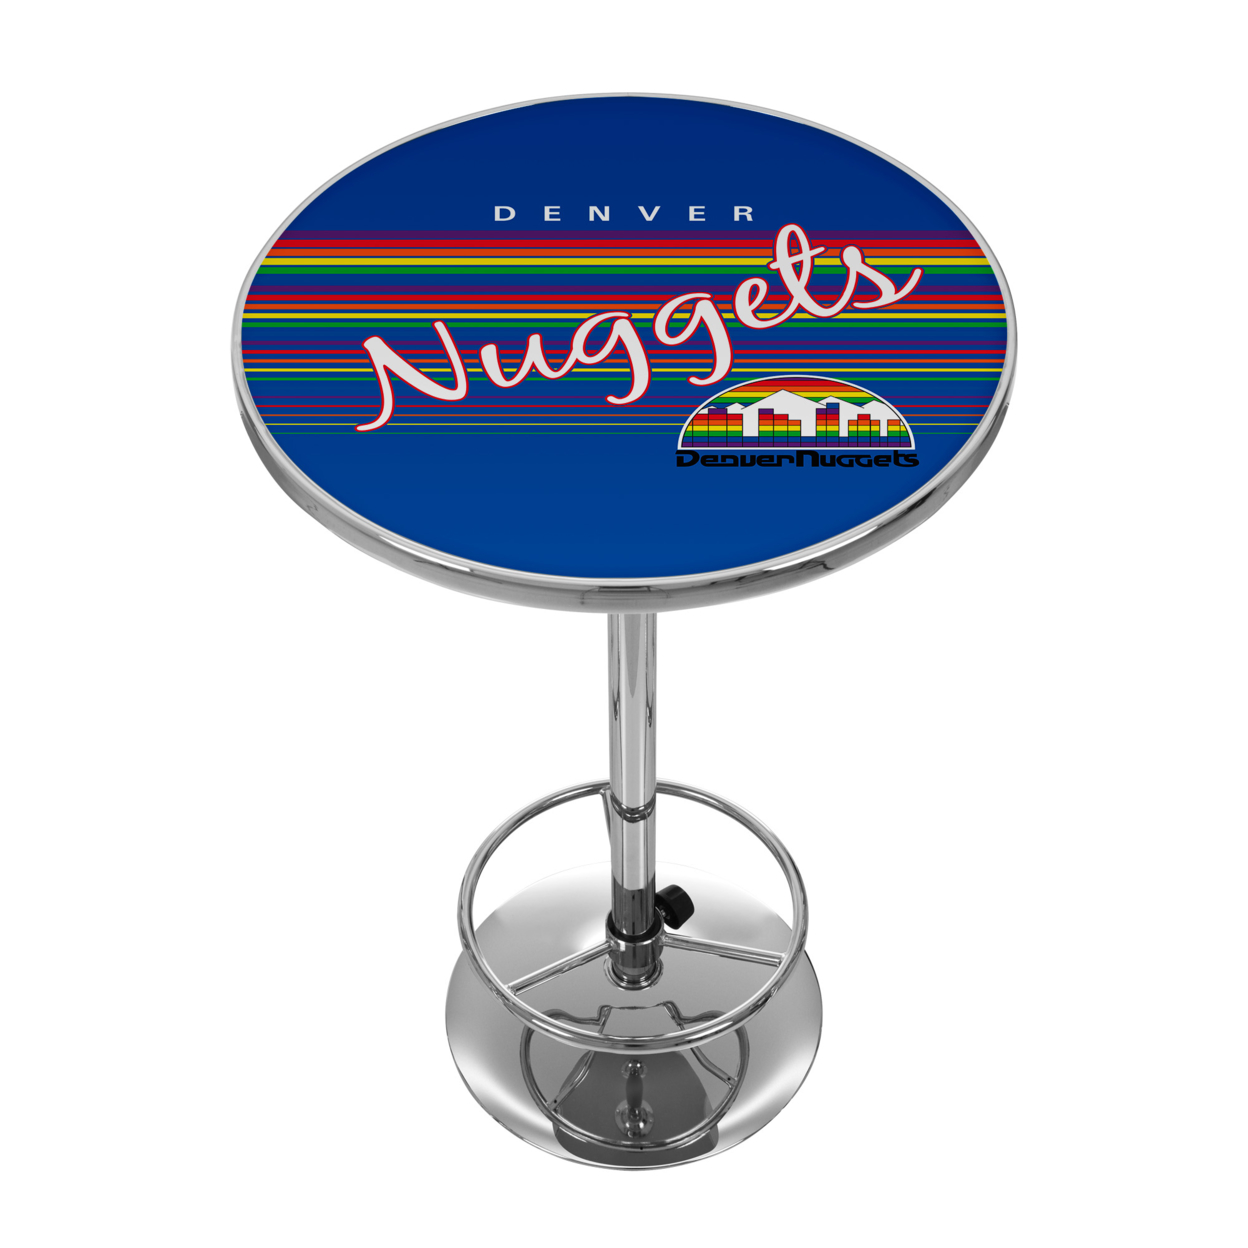 Denver Nuggets Hardwood Classics NBA Chrome 42 Inch Pub Table gardner denver 301efc6013